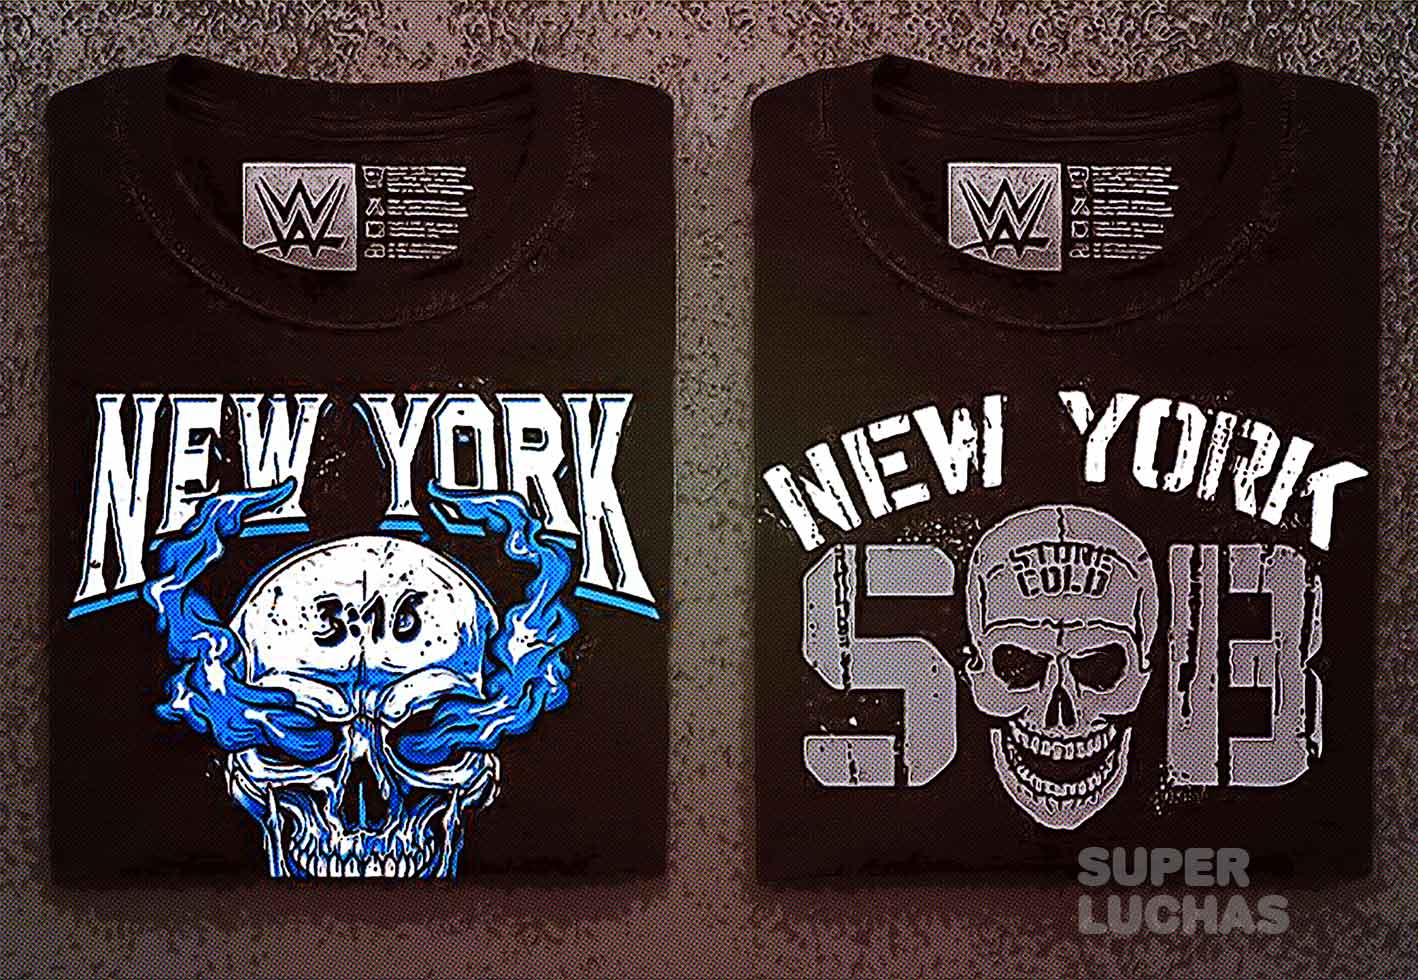 Las nuevas camisetas de Stone Cold Steve Austin